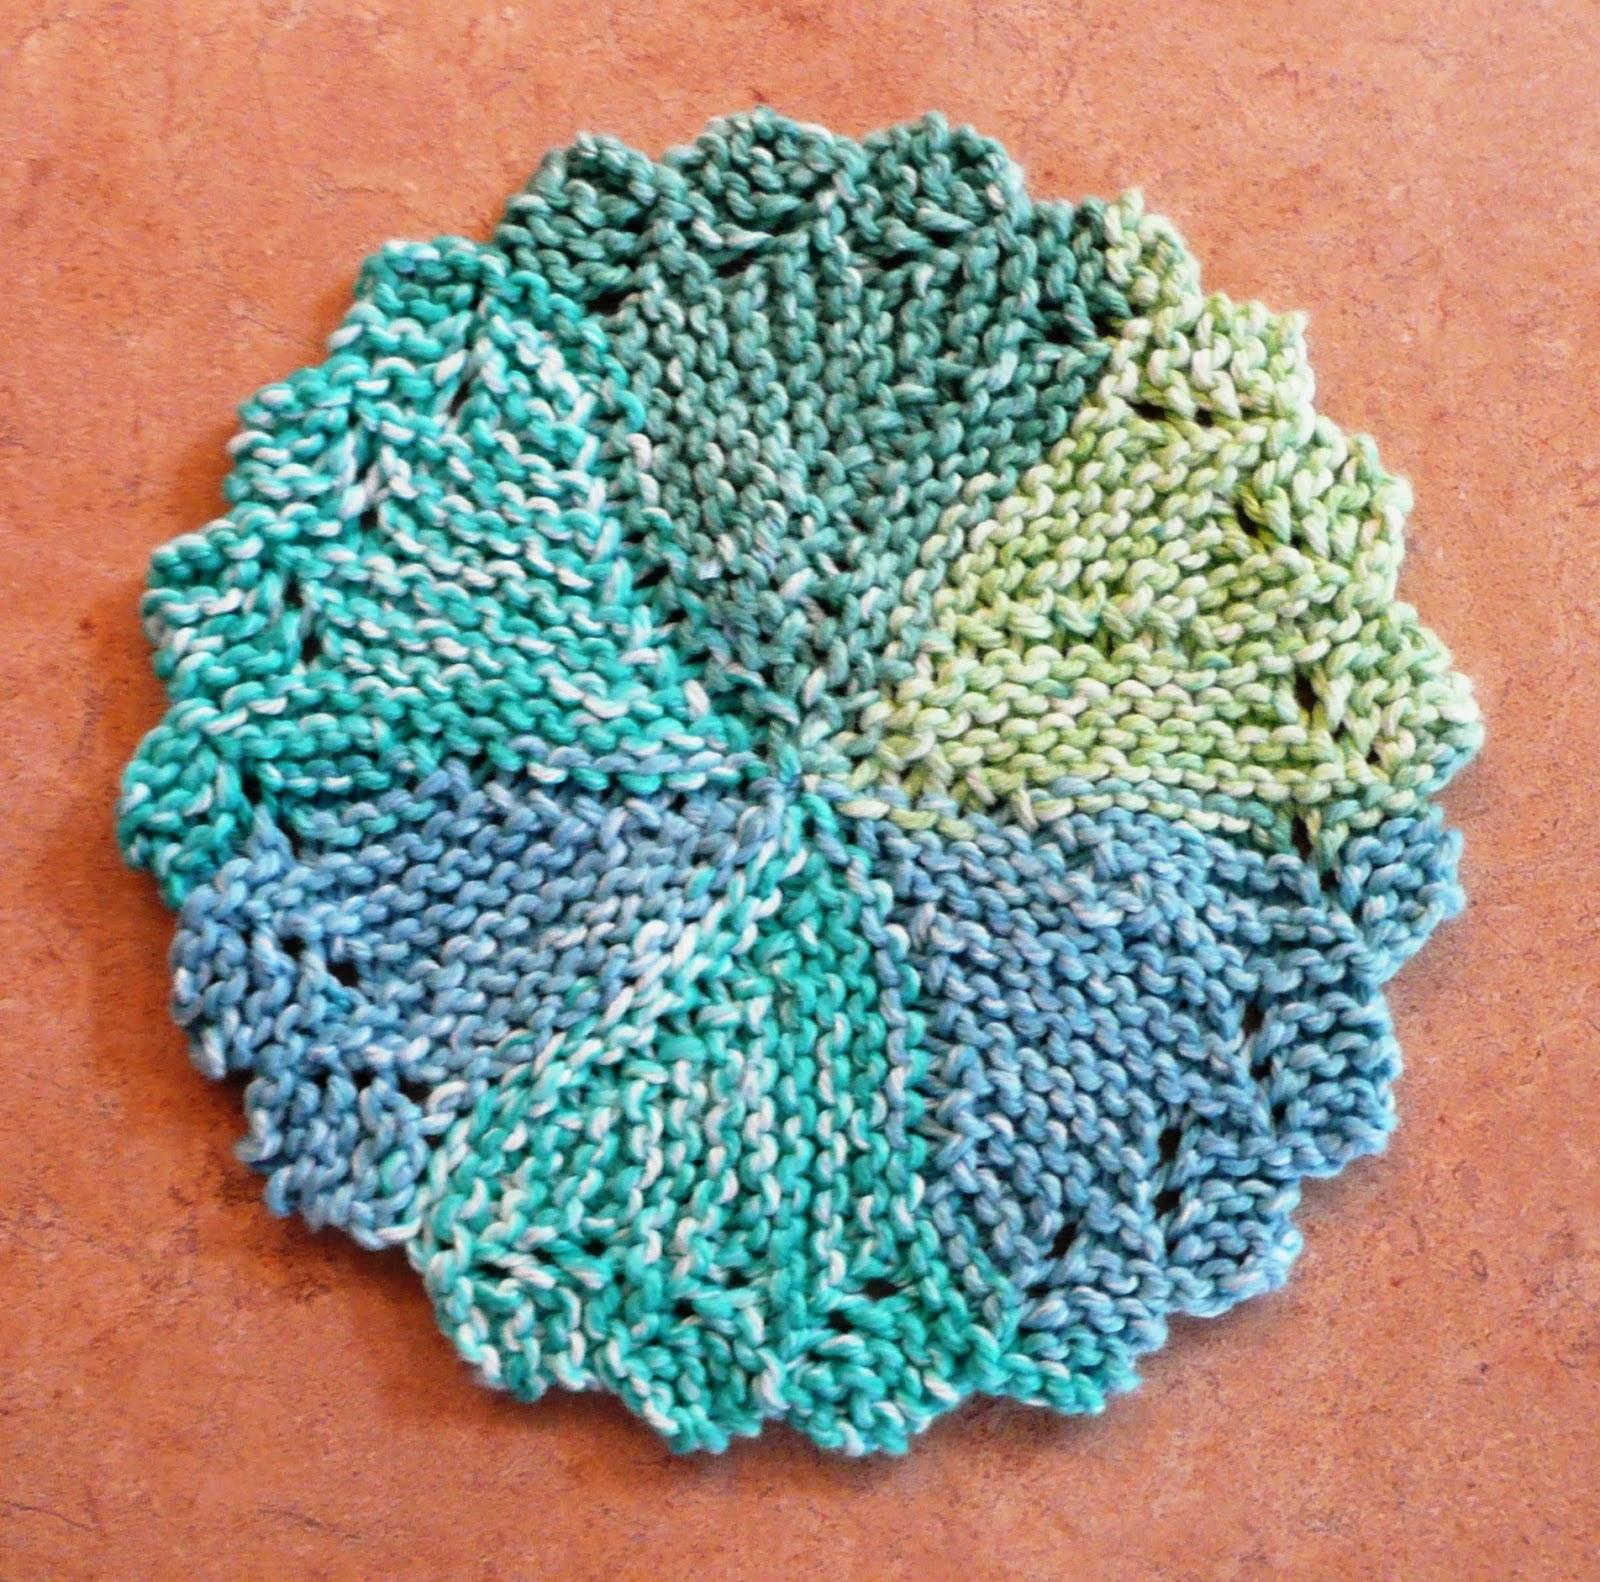 Lacy Round Dishcloth Free Knitting Pattern ⋆ Knitting Bee